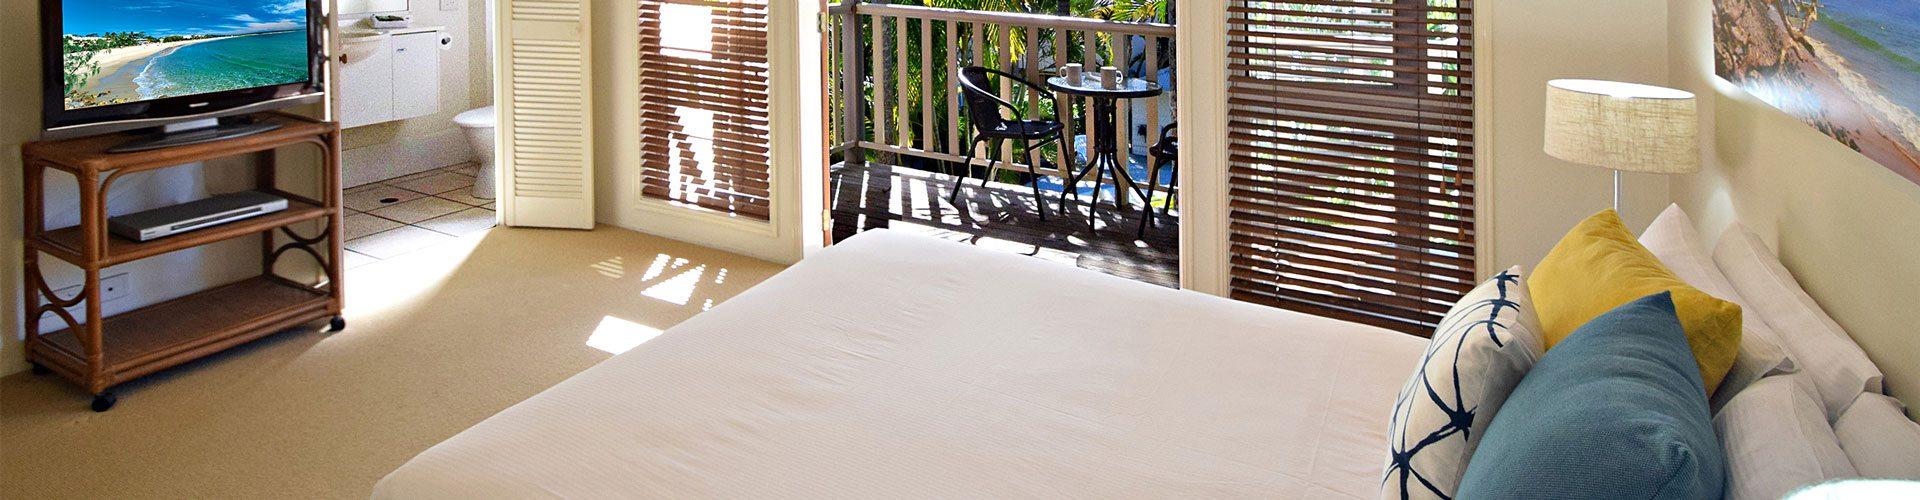 Noosa-Accommodation-Three-Bed-Villas-